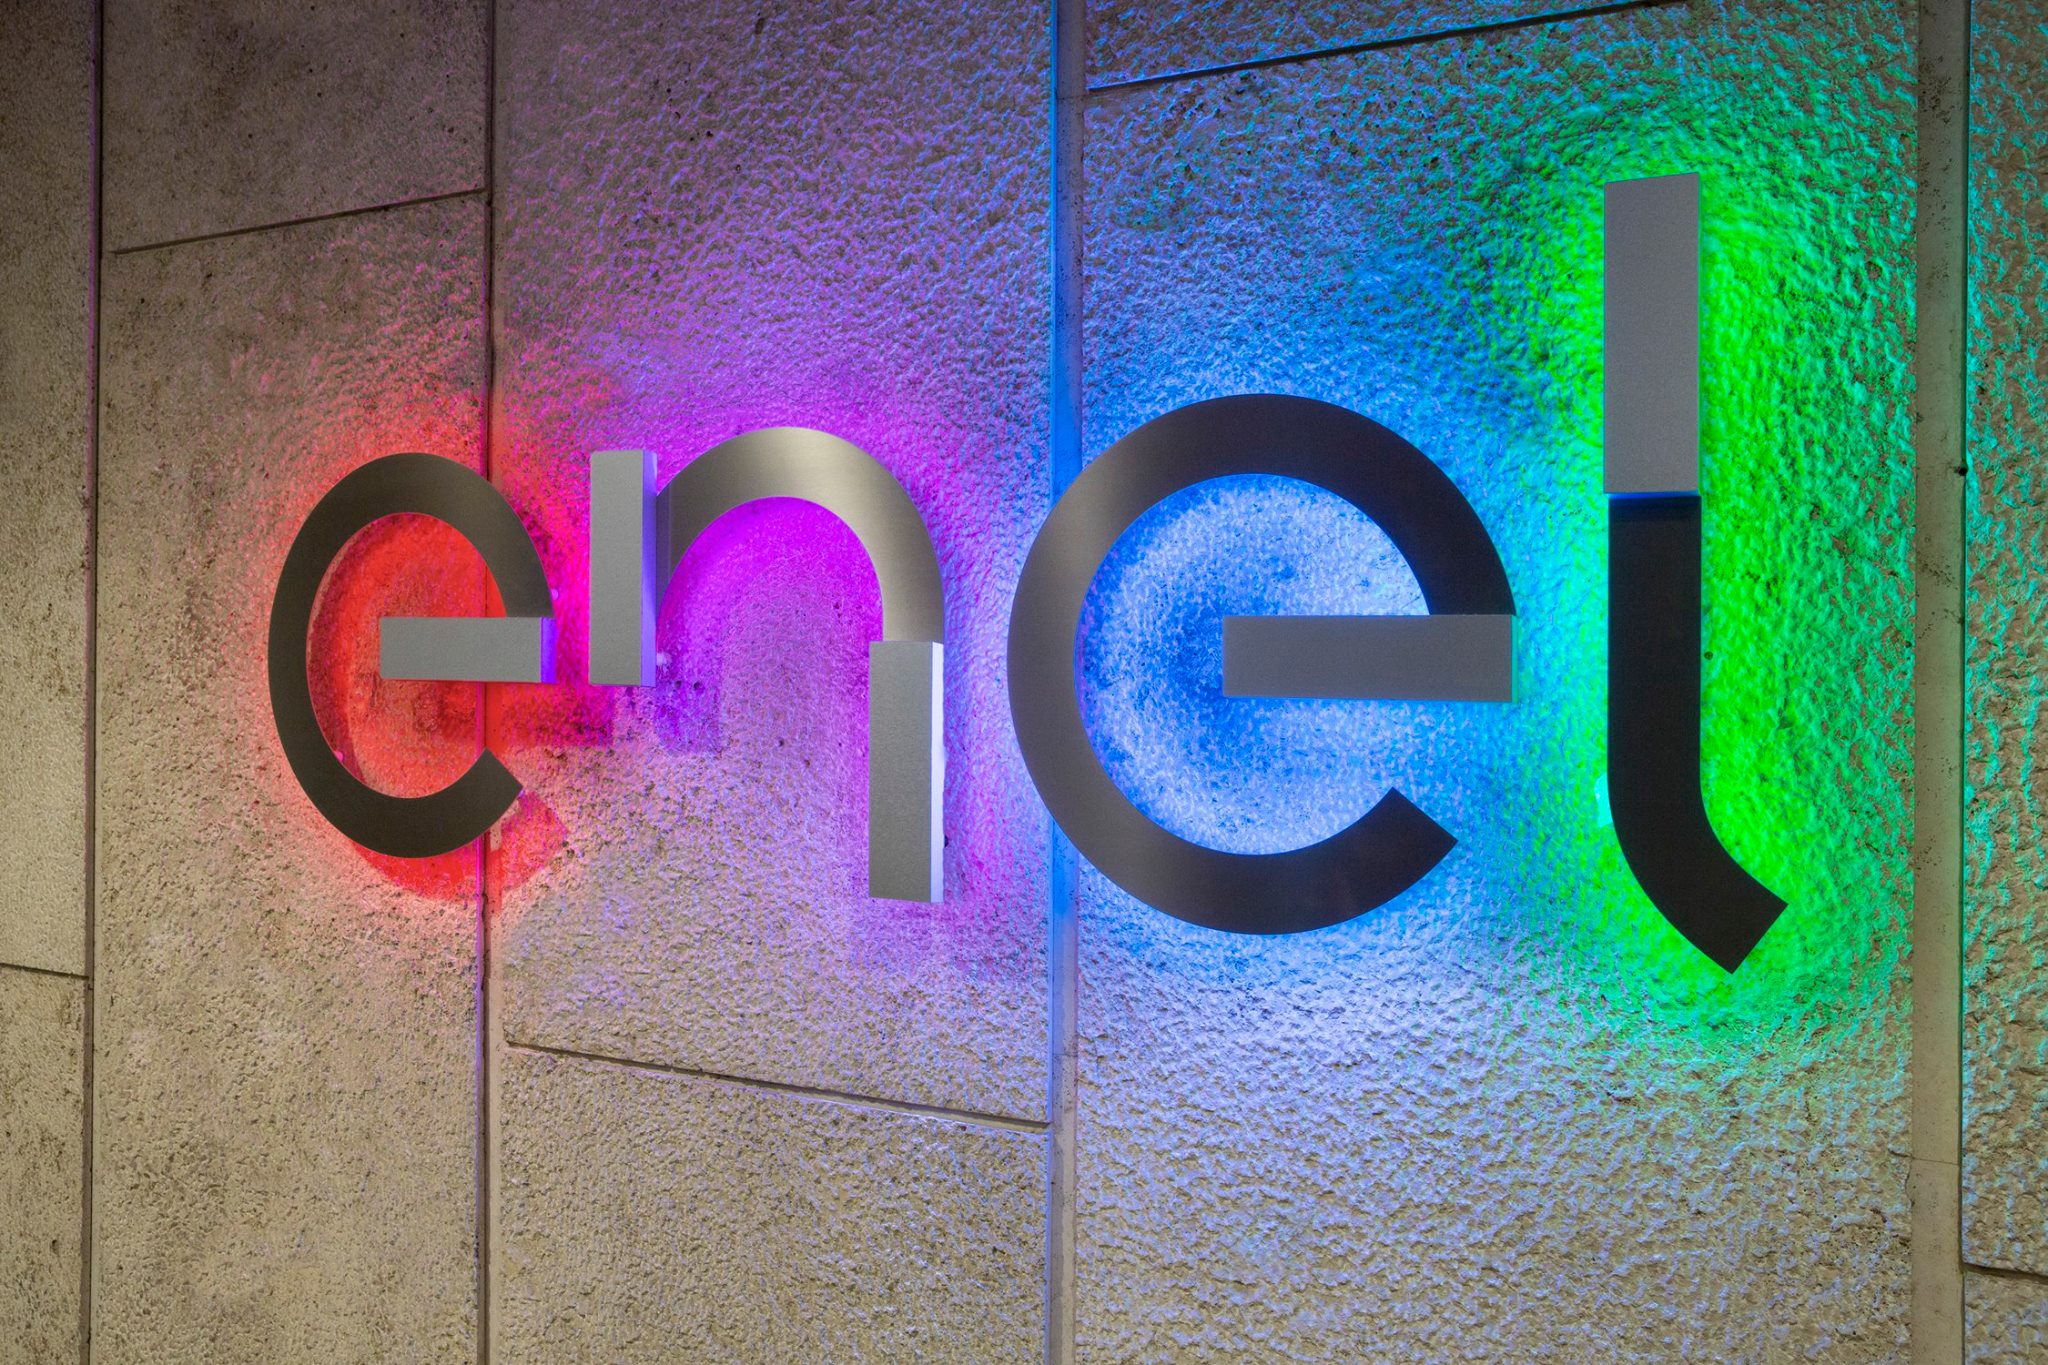 Enel to invest 329 mln euro in Romania in 2017-2018